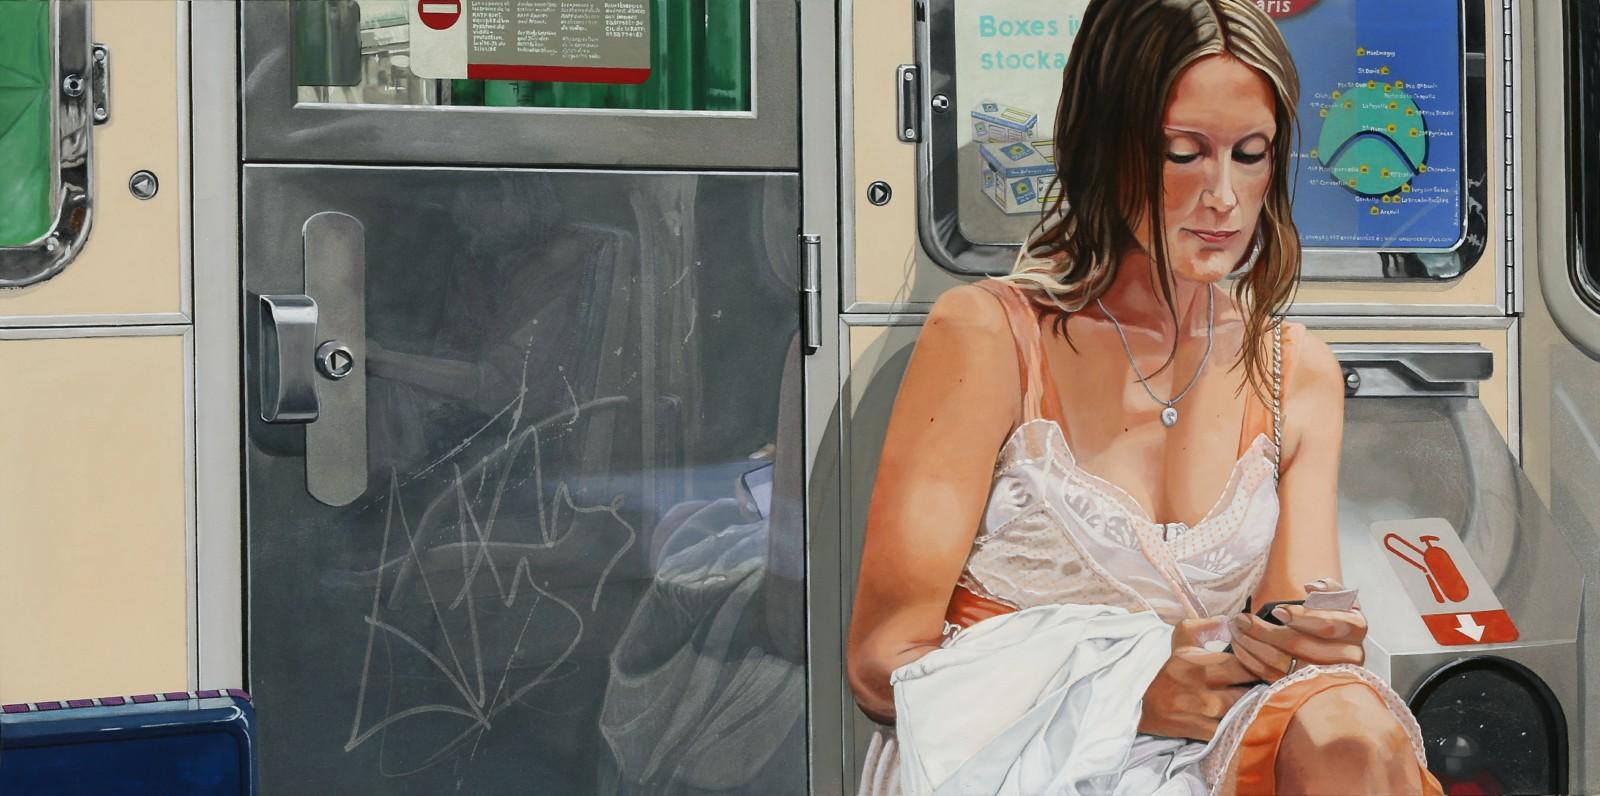 Peinture hyperréalisme Hervé Bernard : Alice in the tube